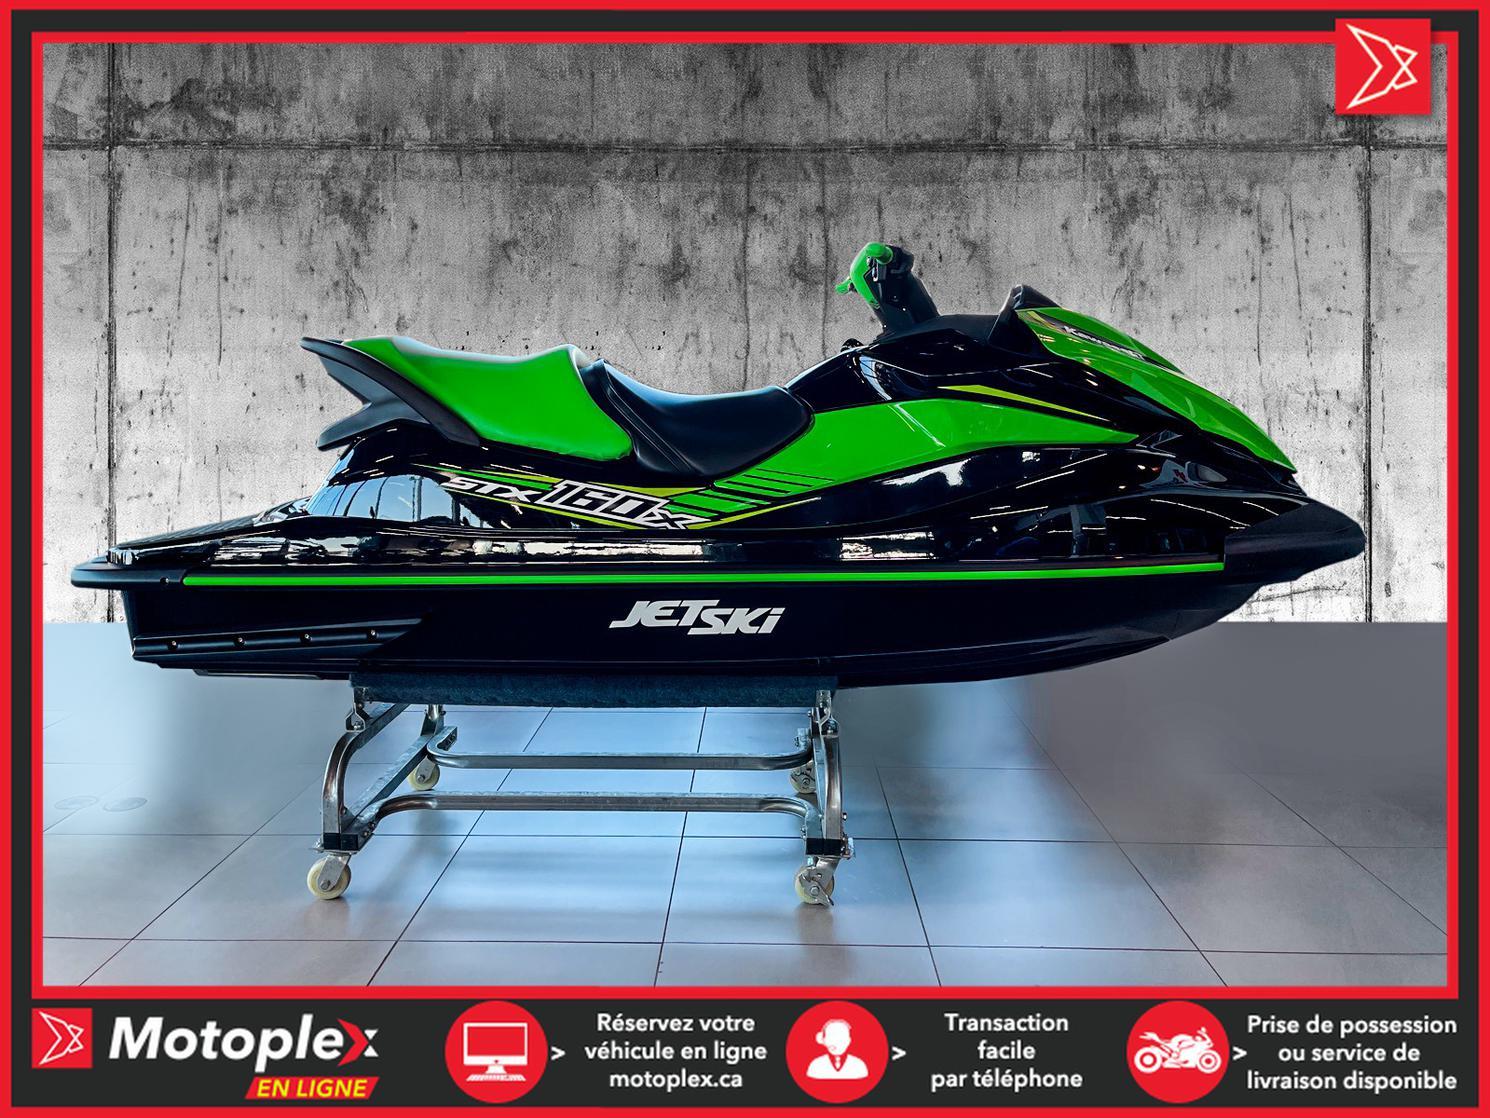 Kawasaki MOTOMARINE JET SKI STX 160LX (3 PLACES) 2021